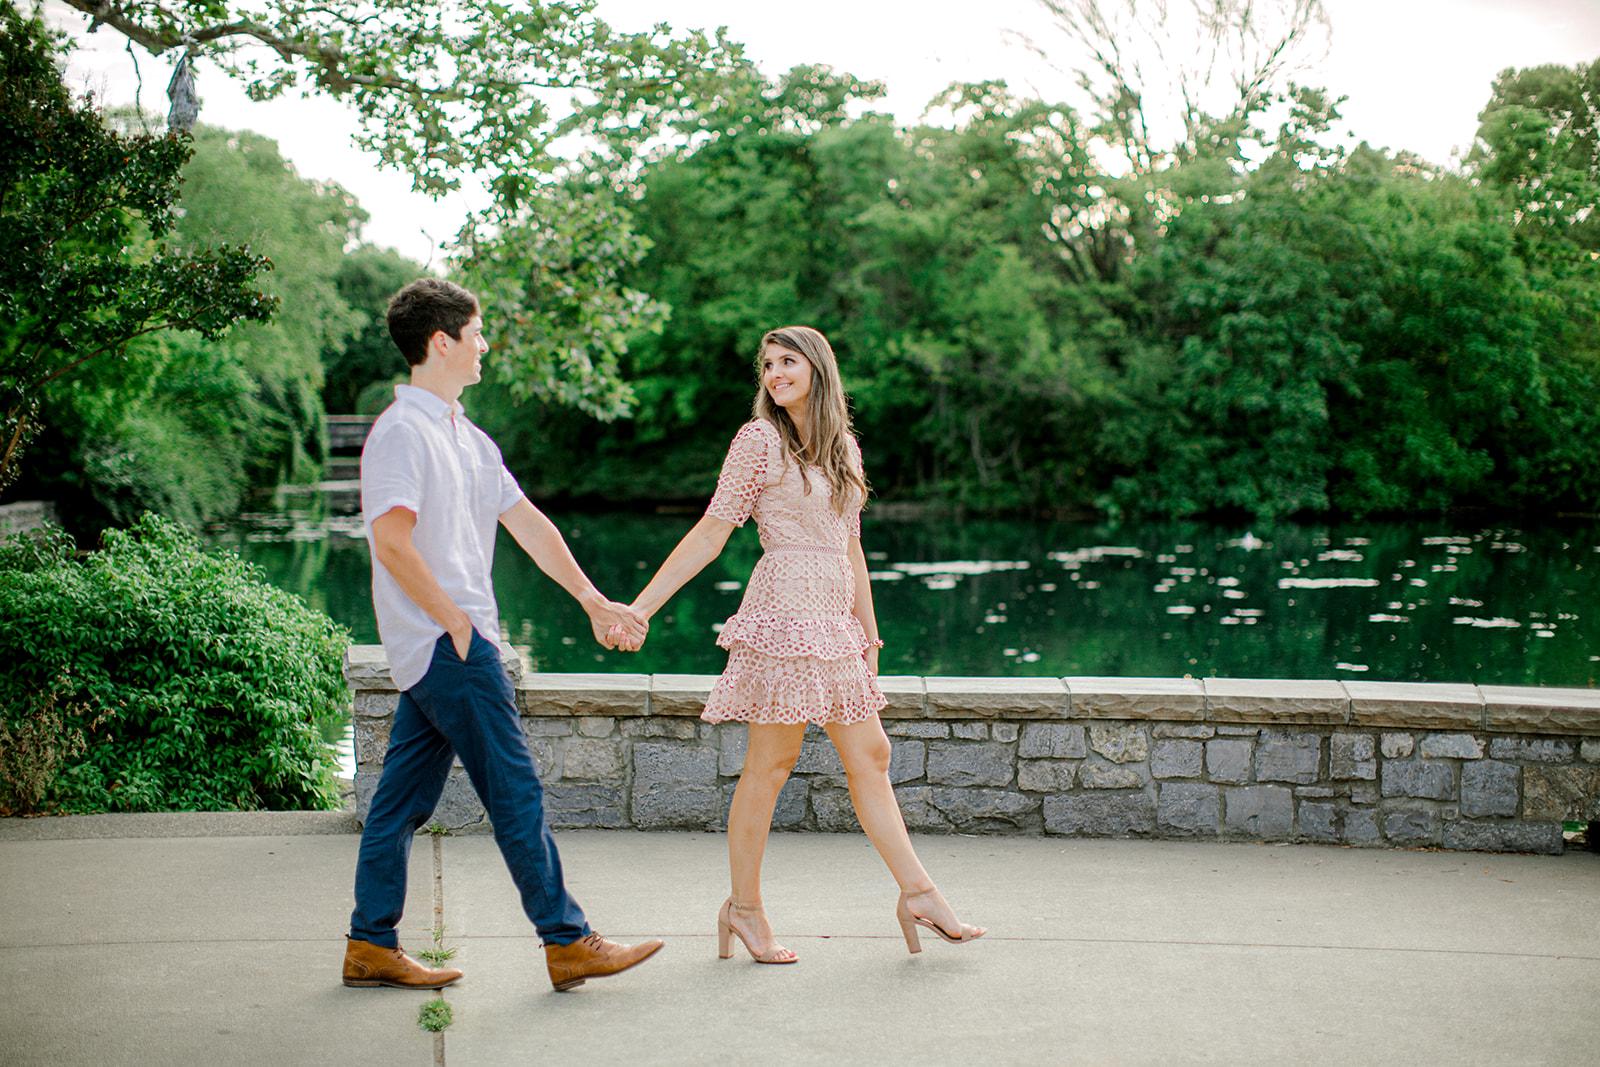 Centennial Park Nashville Engagement Session by Ashton Brooke Photography featured on Nashville Bride Guide